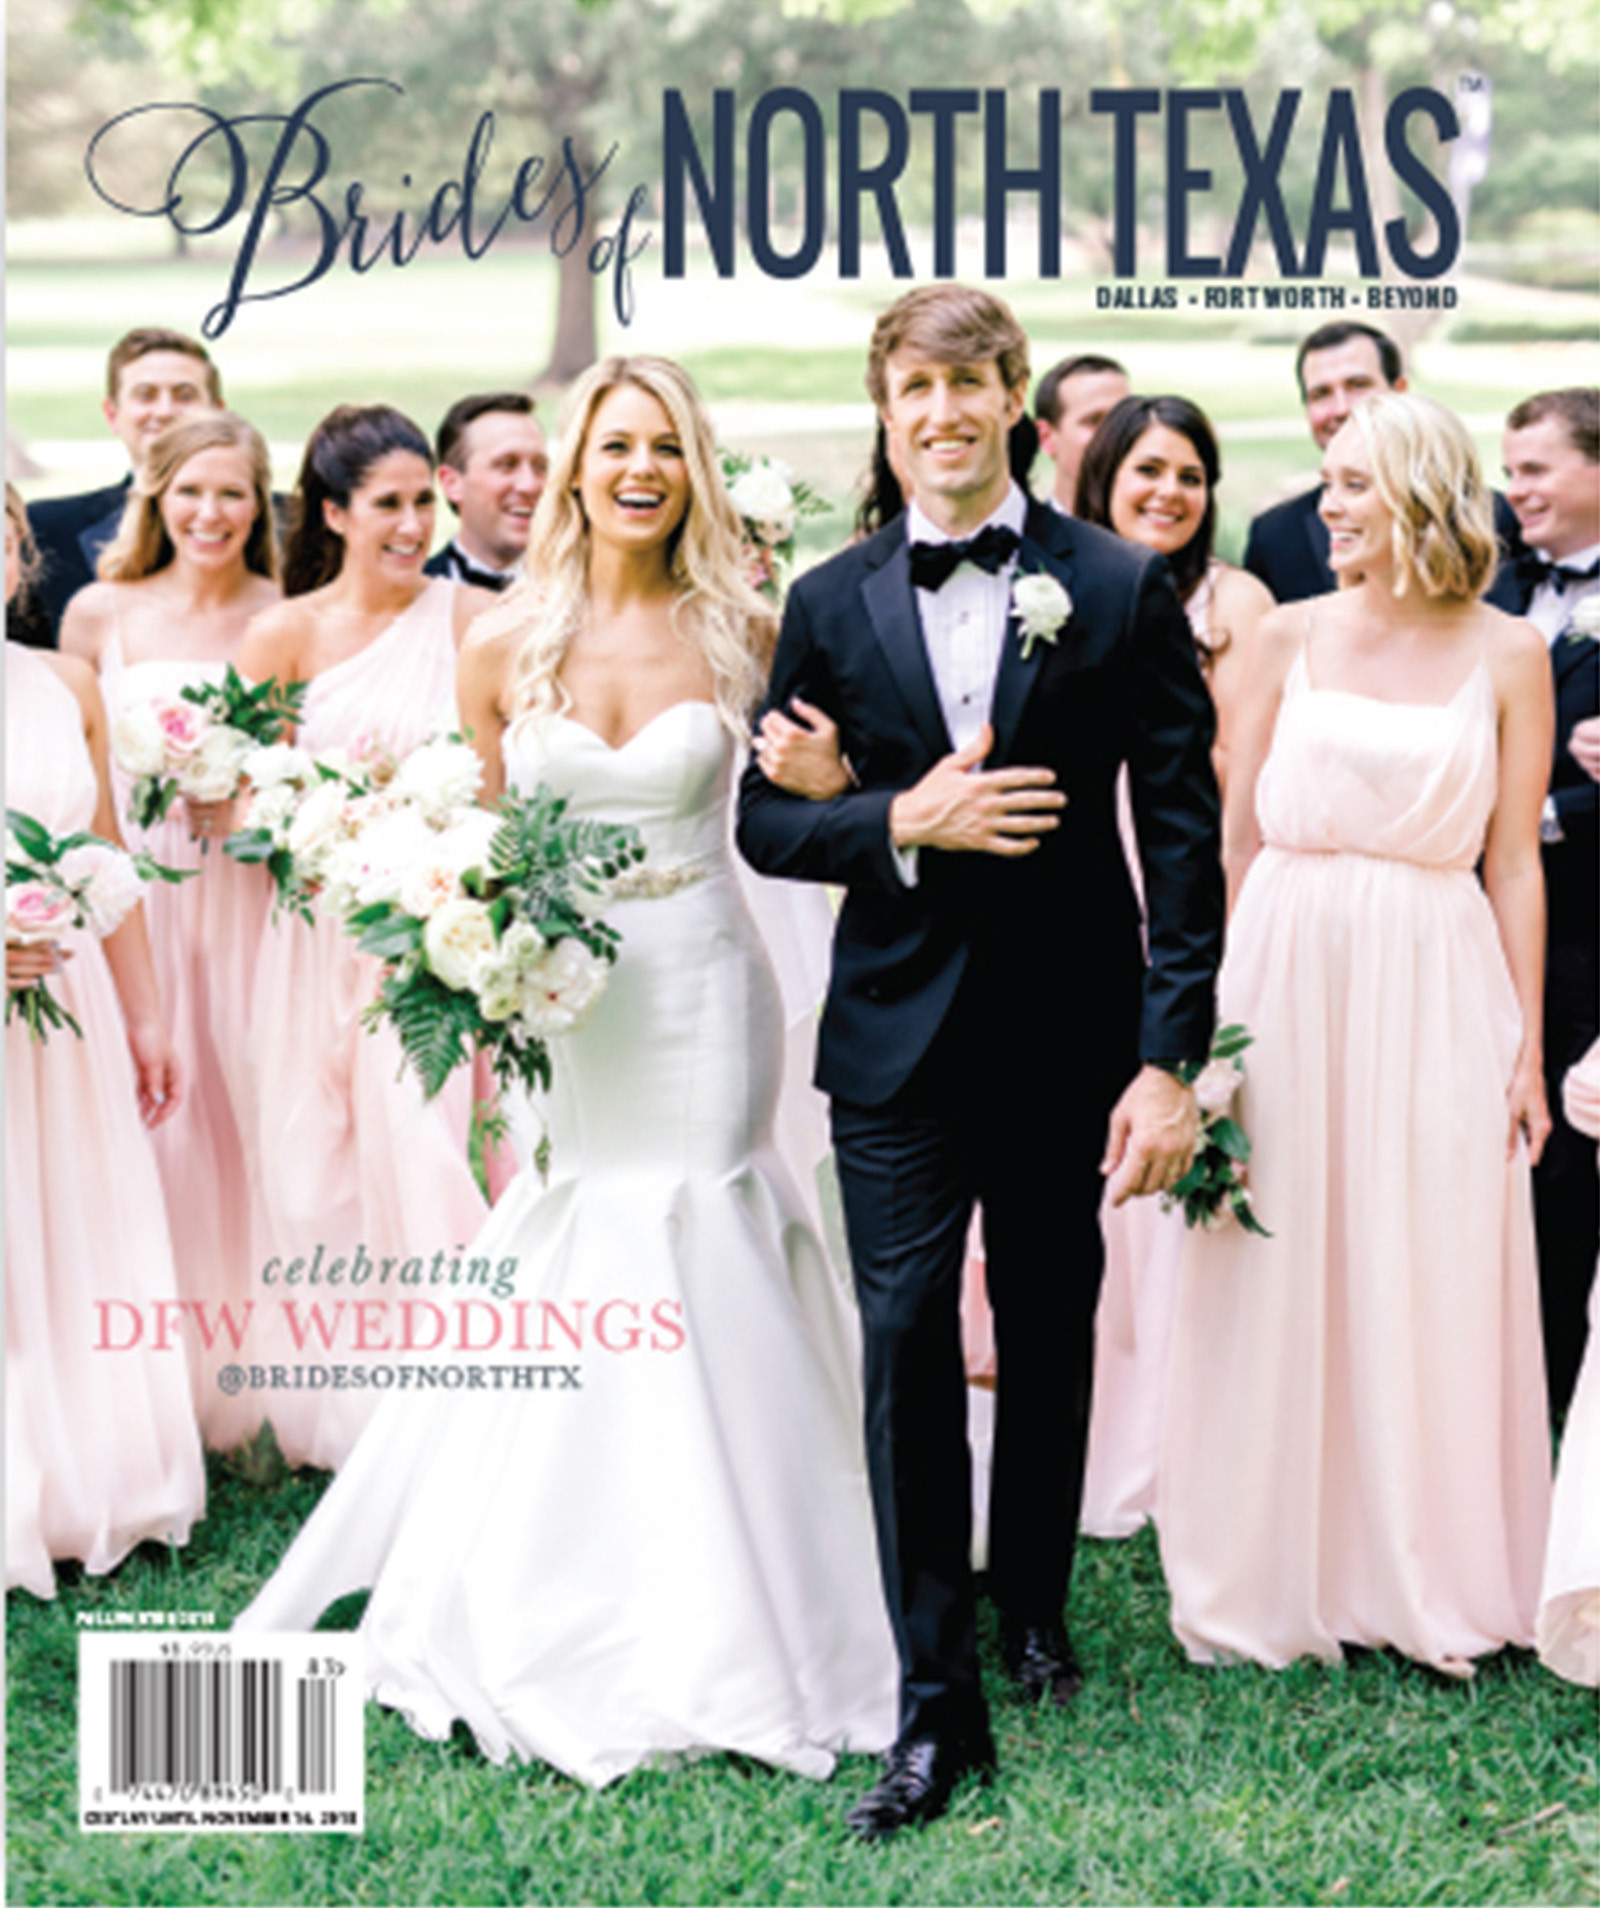 Gaun Pengantin Muslimah Modern 2018 Beautiful Real Weddings Featured In Brides Of north Texas